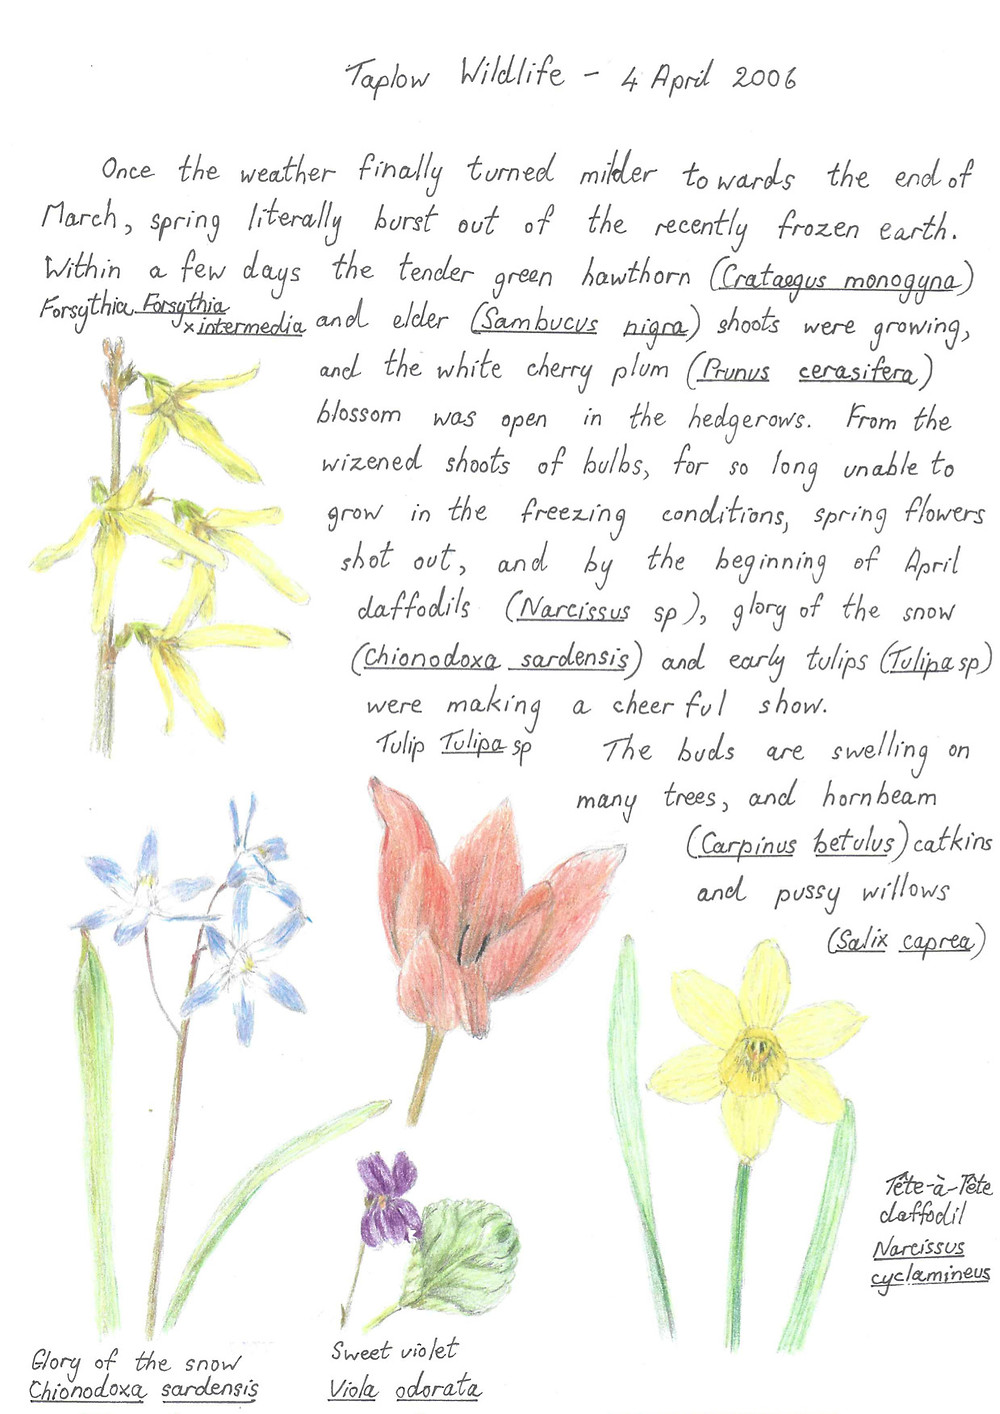 Taplow Wildlife - April 2006